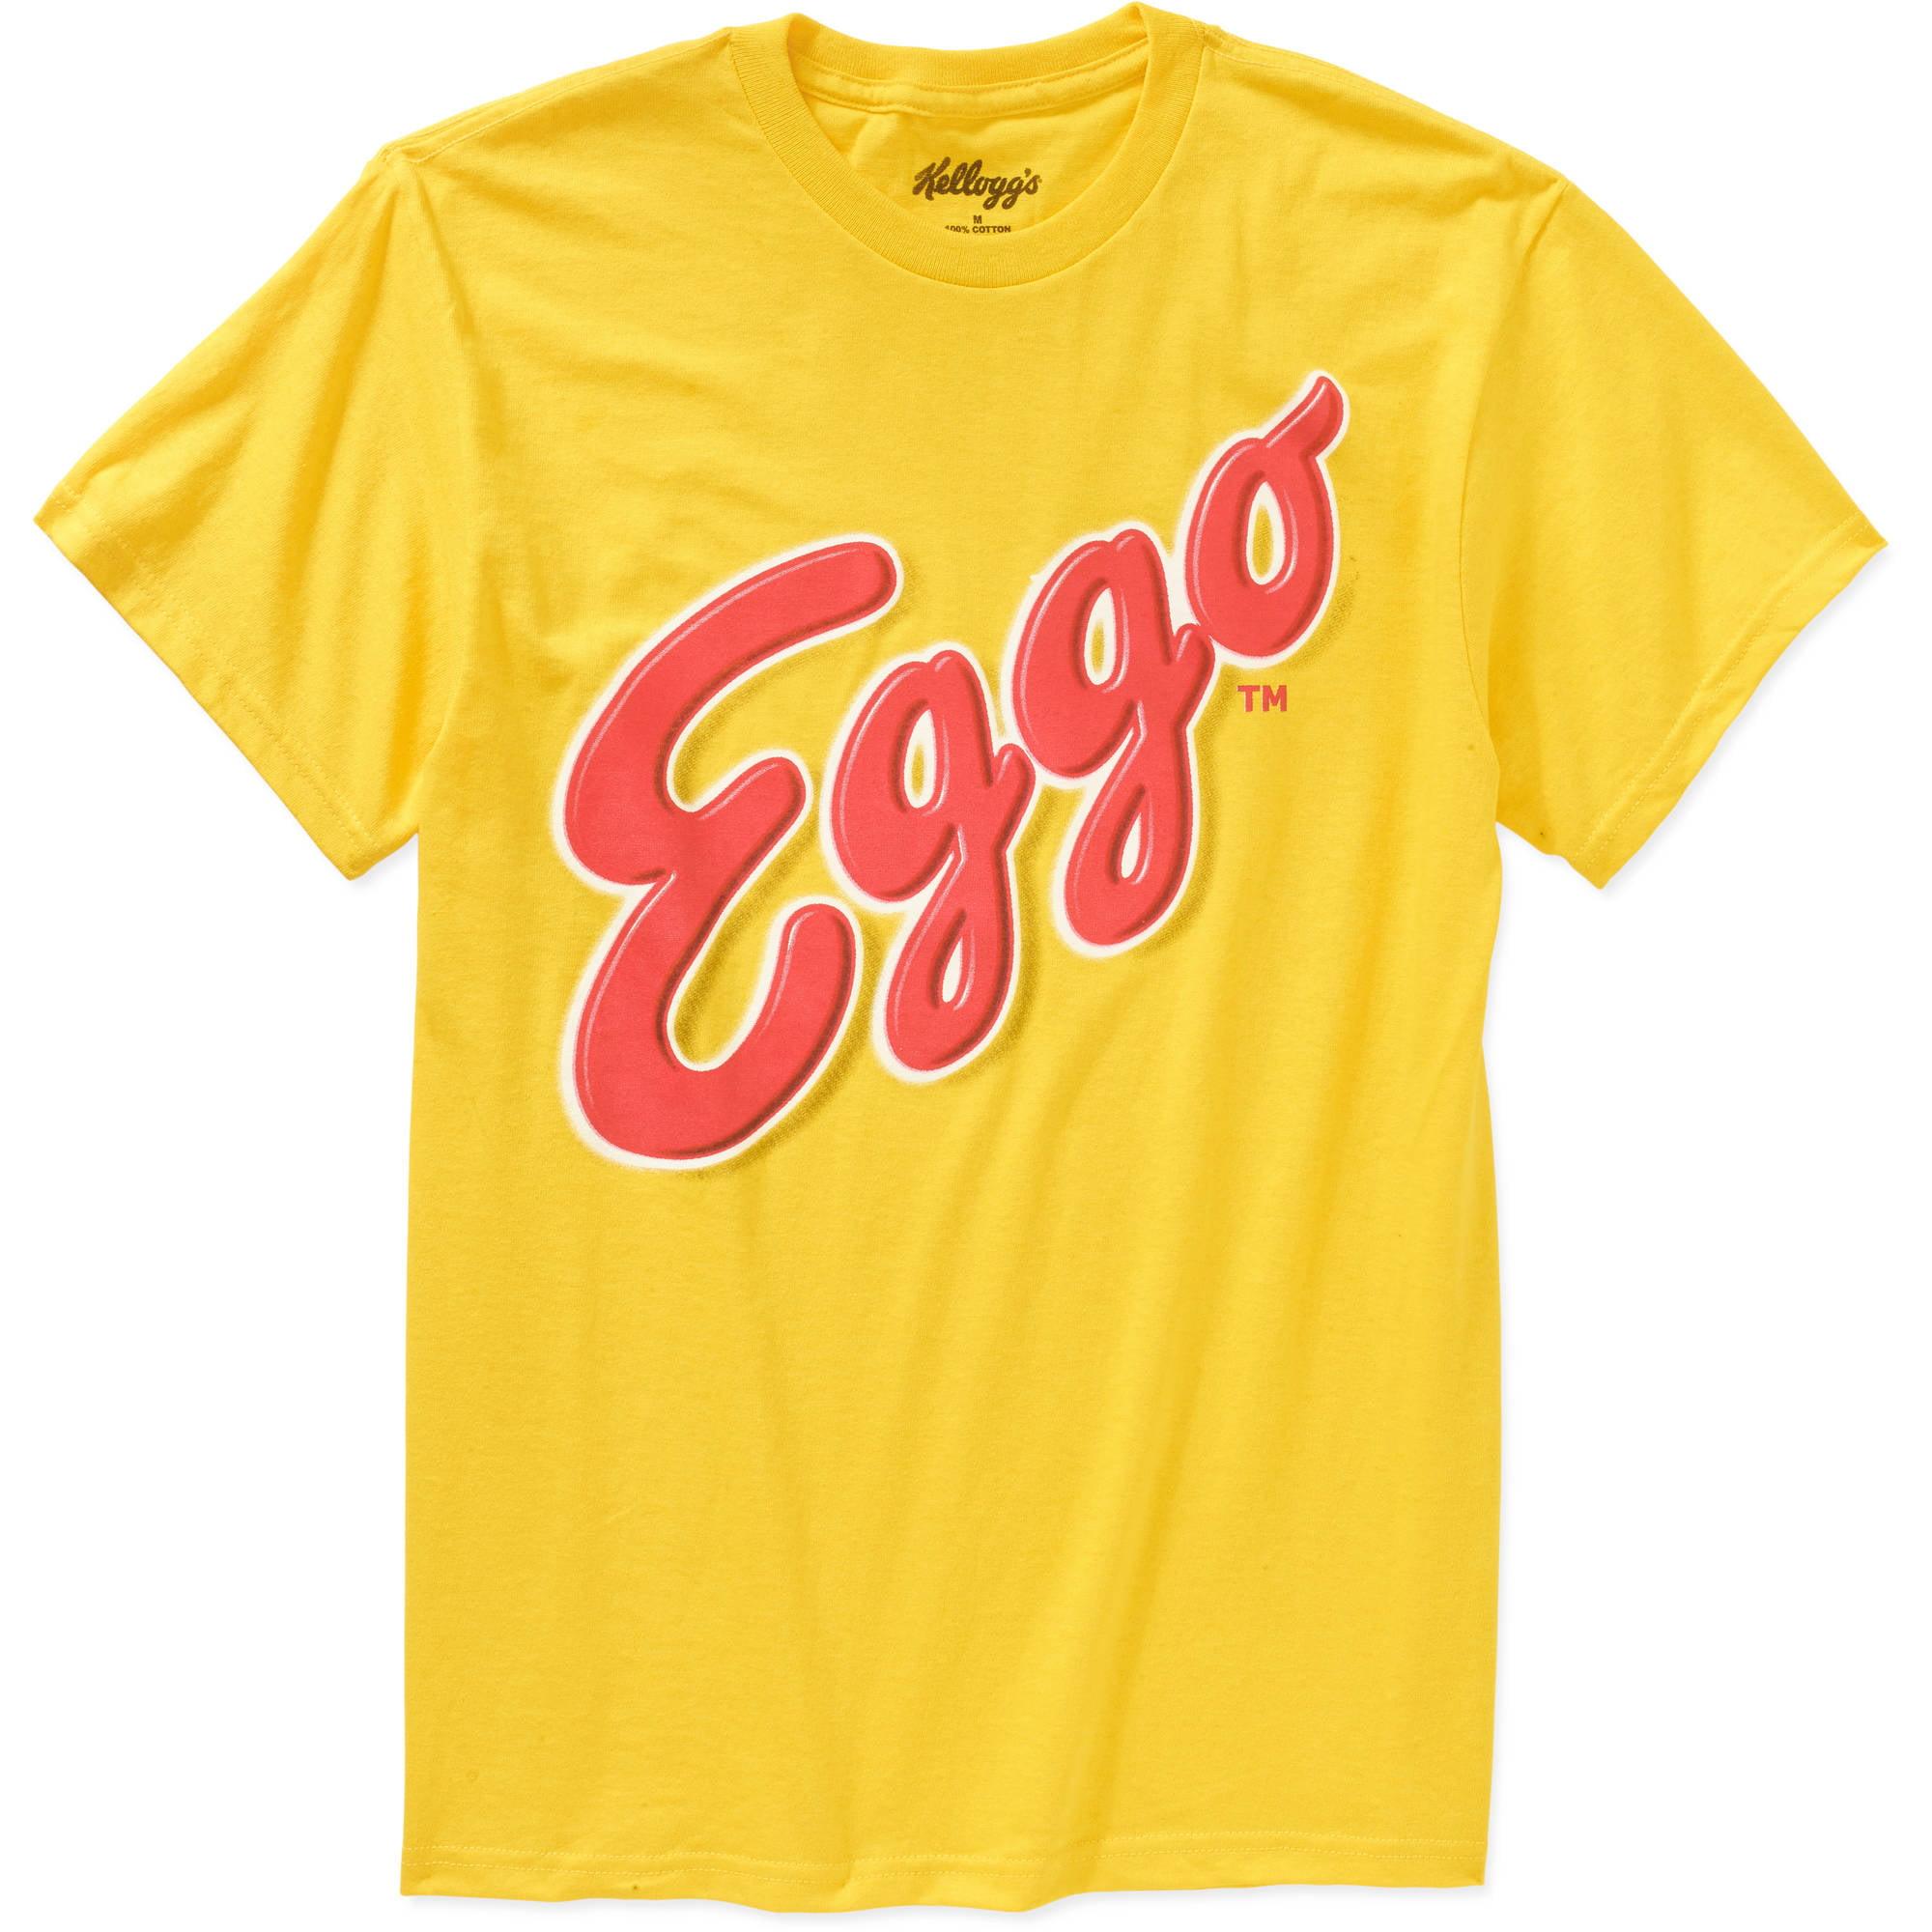 Eggo Logo Men's Graphic Tee